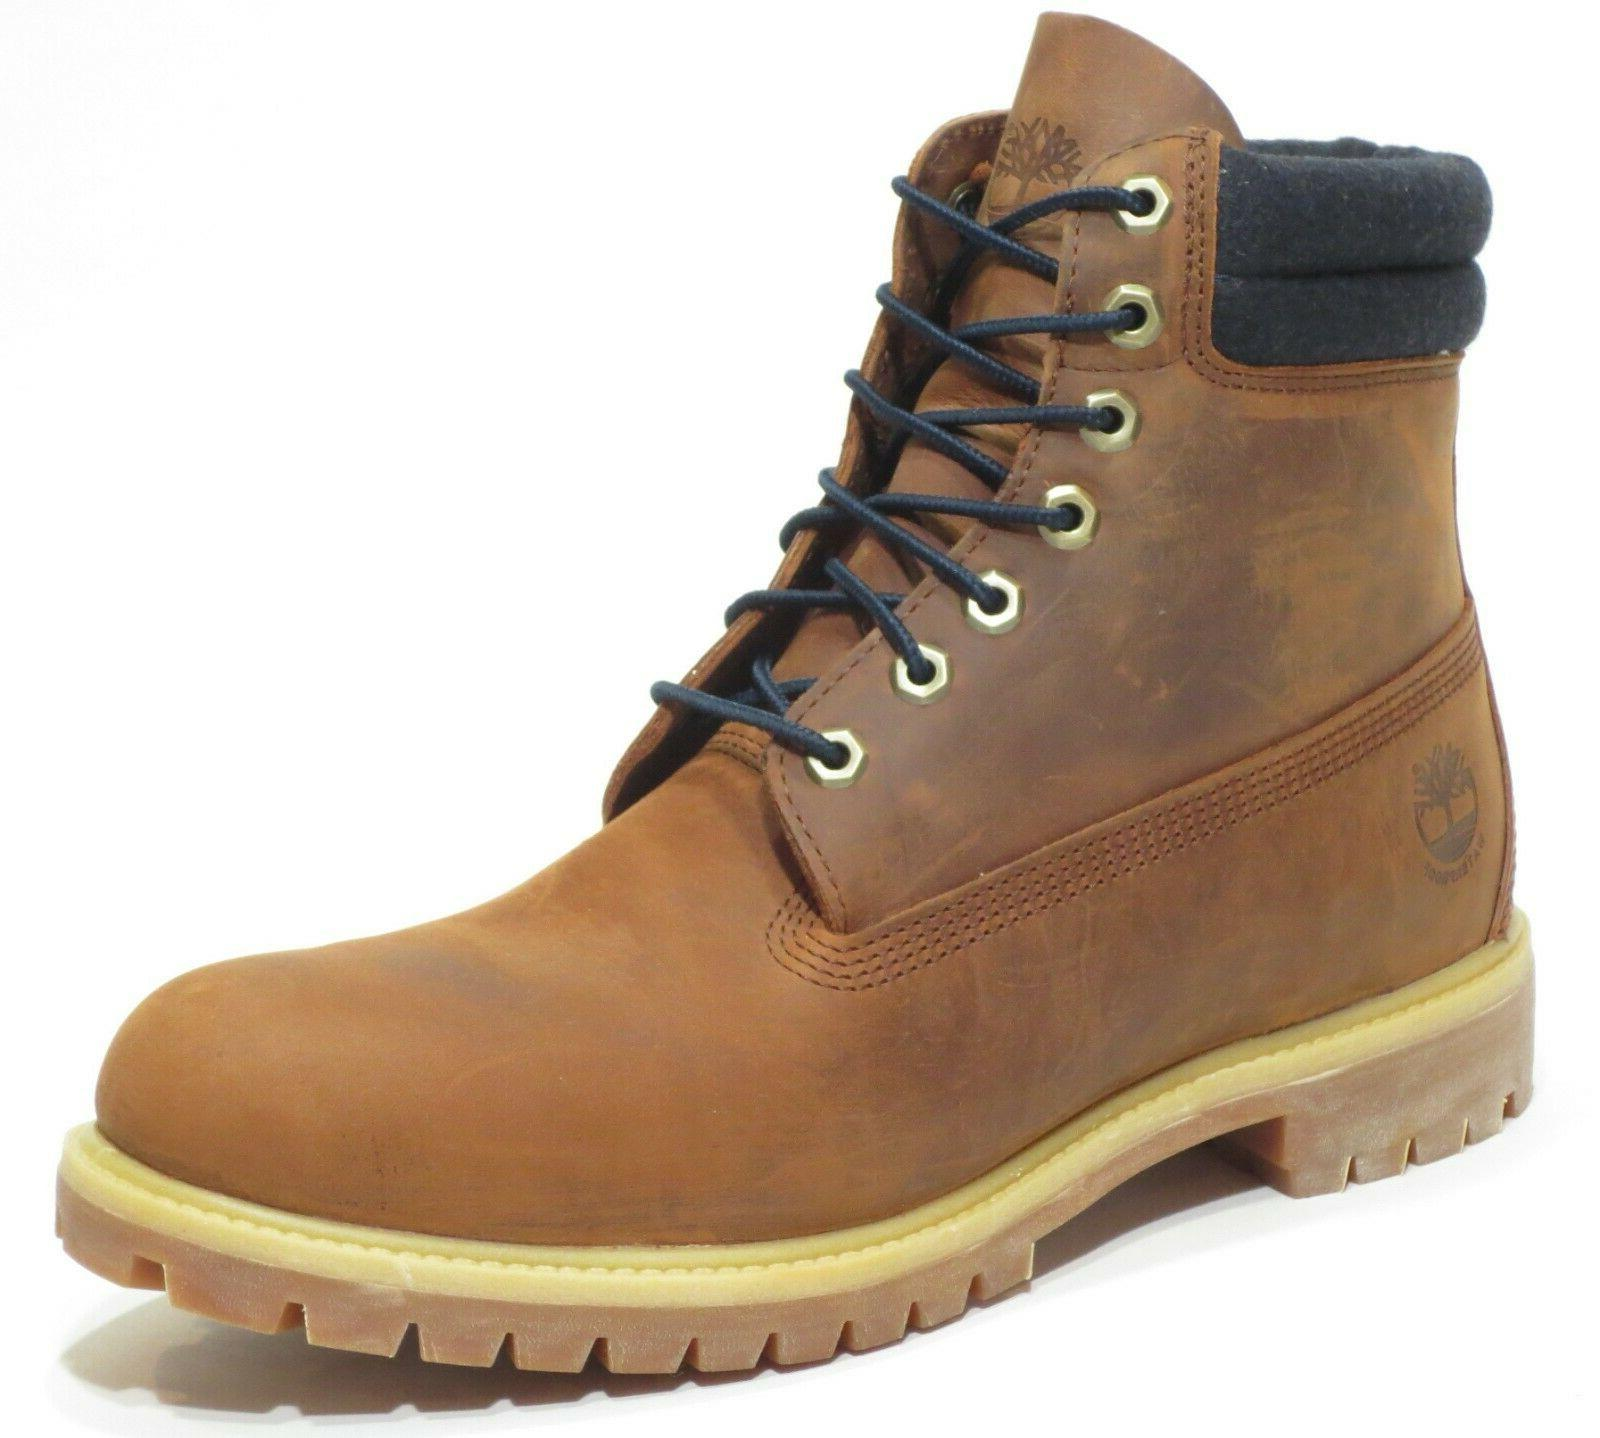 mens brown 6 inch double sole premium